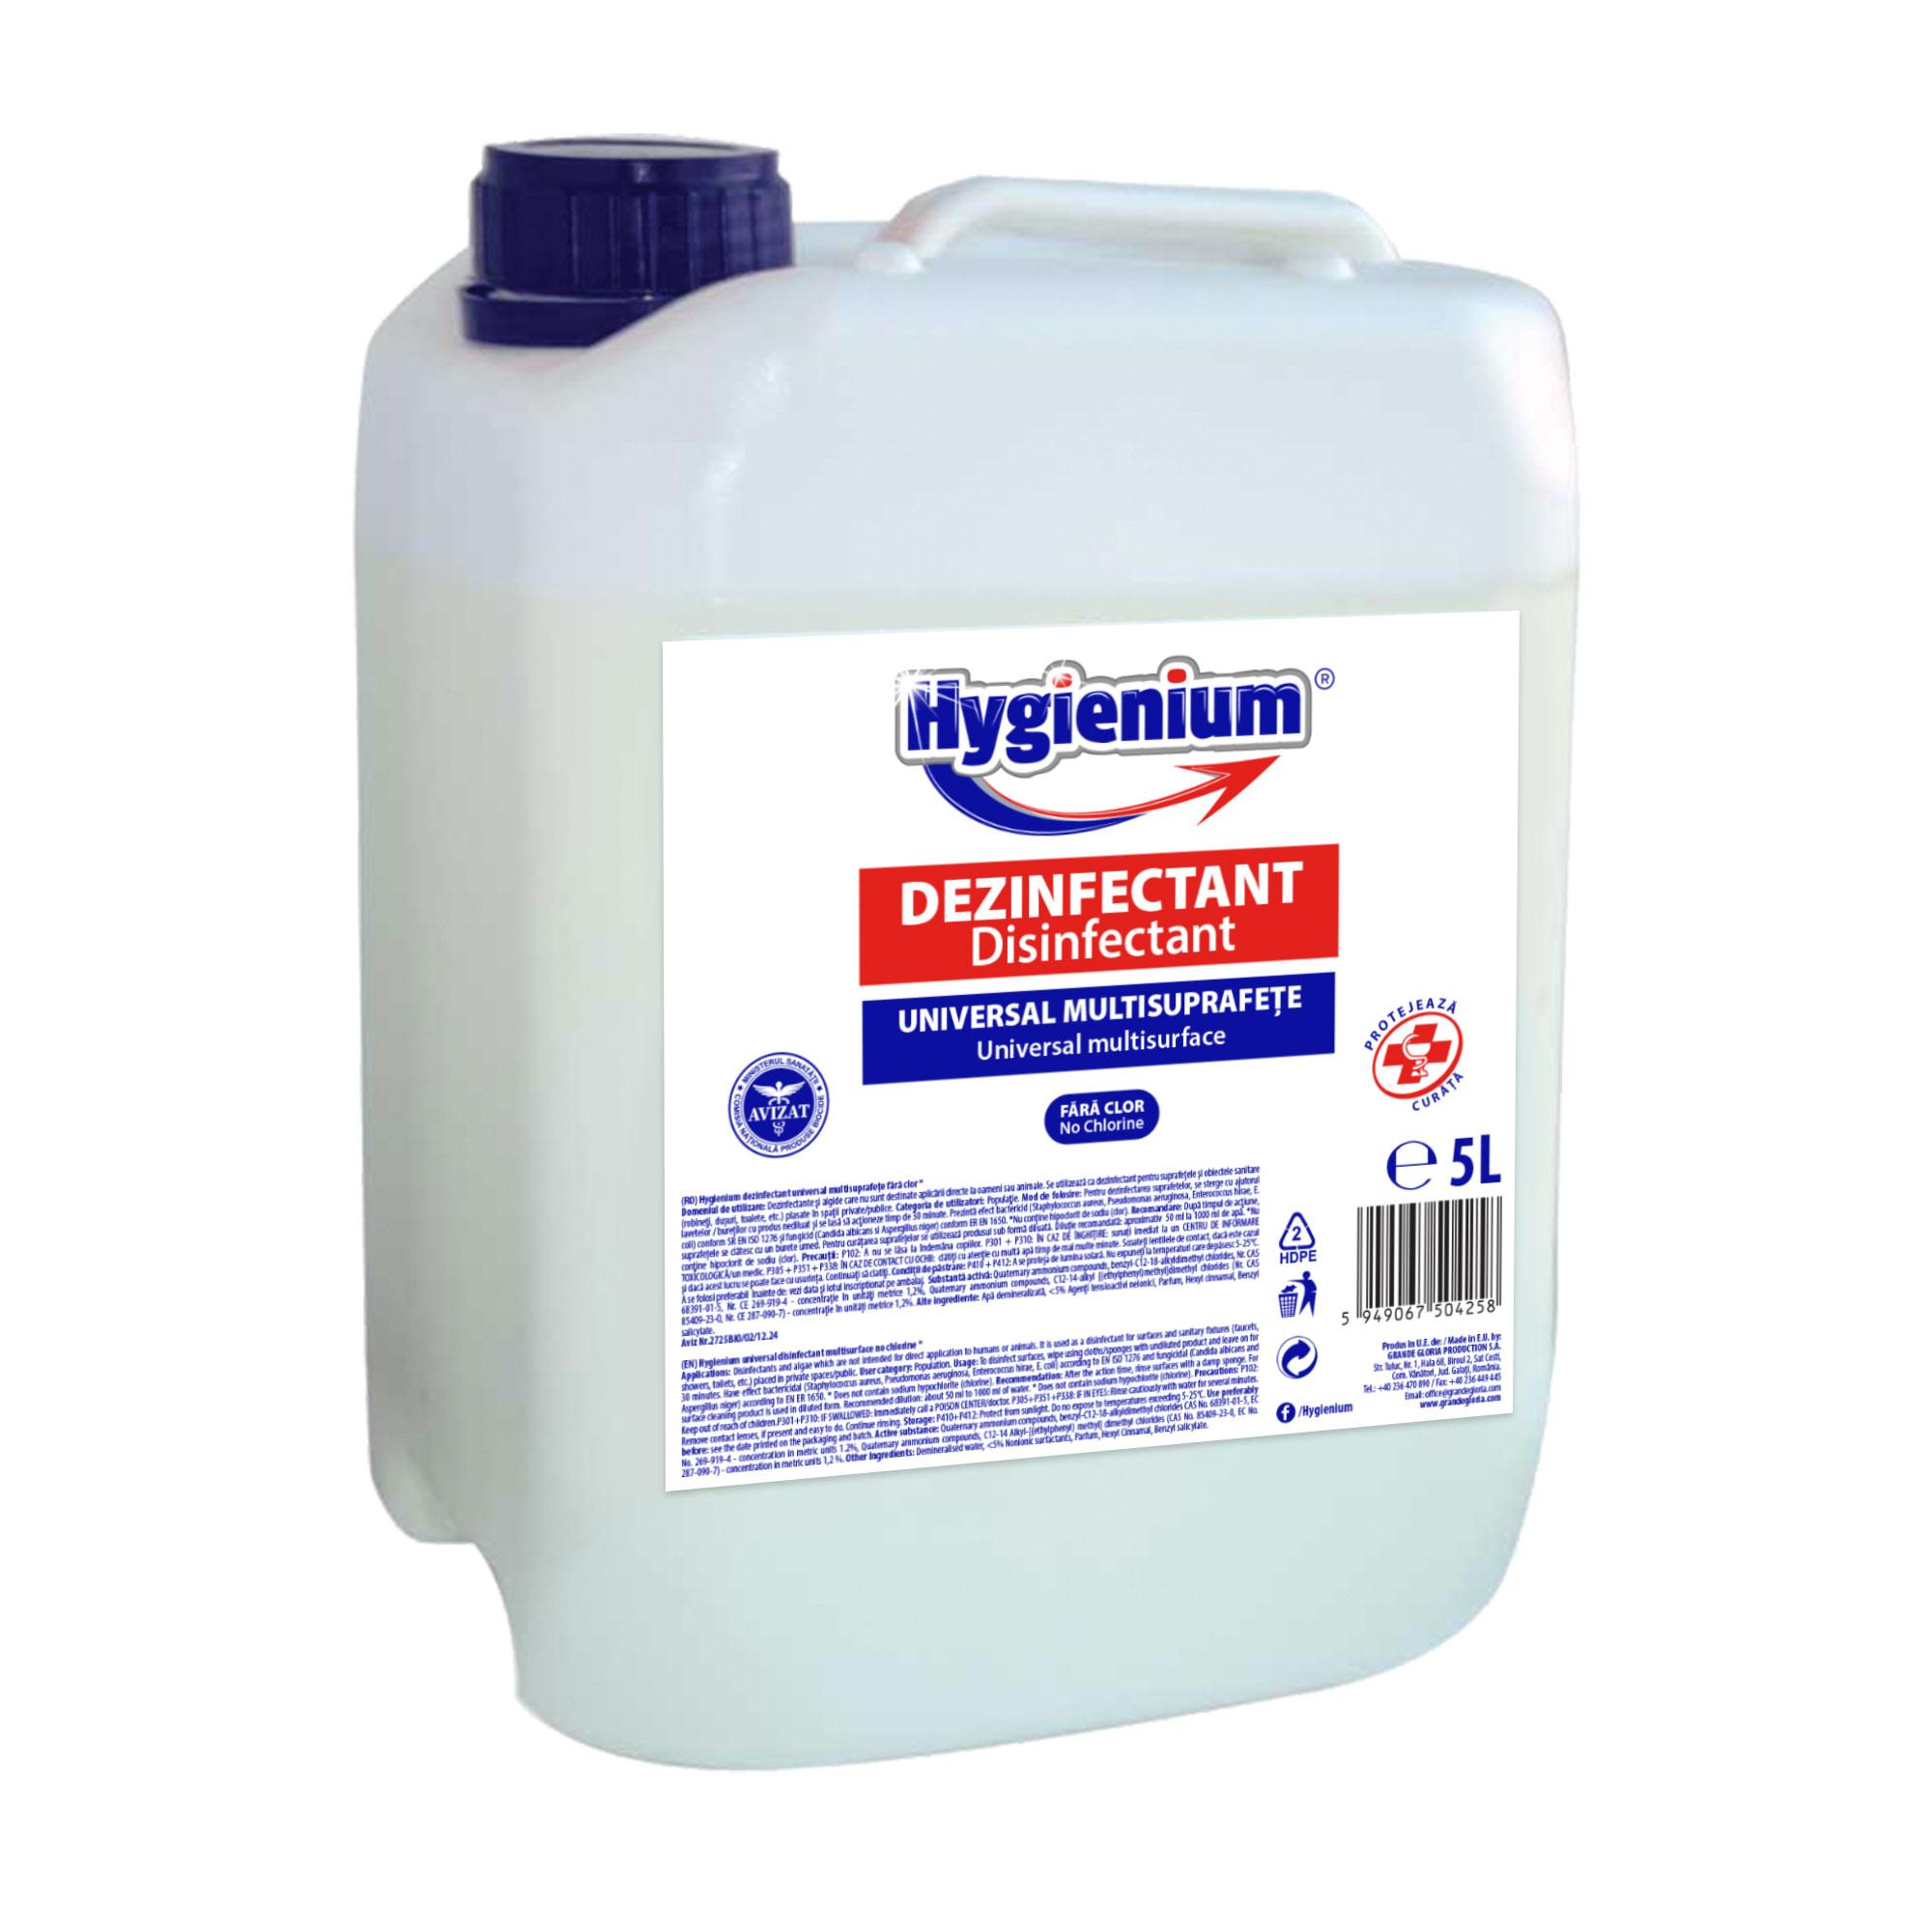 HYGIENIUM UNIVERSAL MULTISURFACE DISINFECTANT 5 l